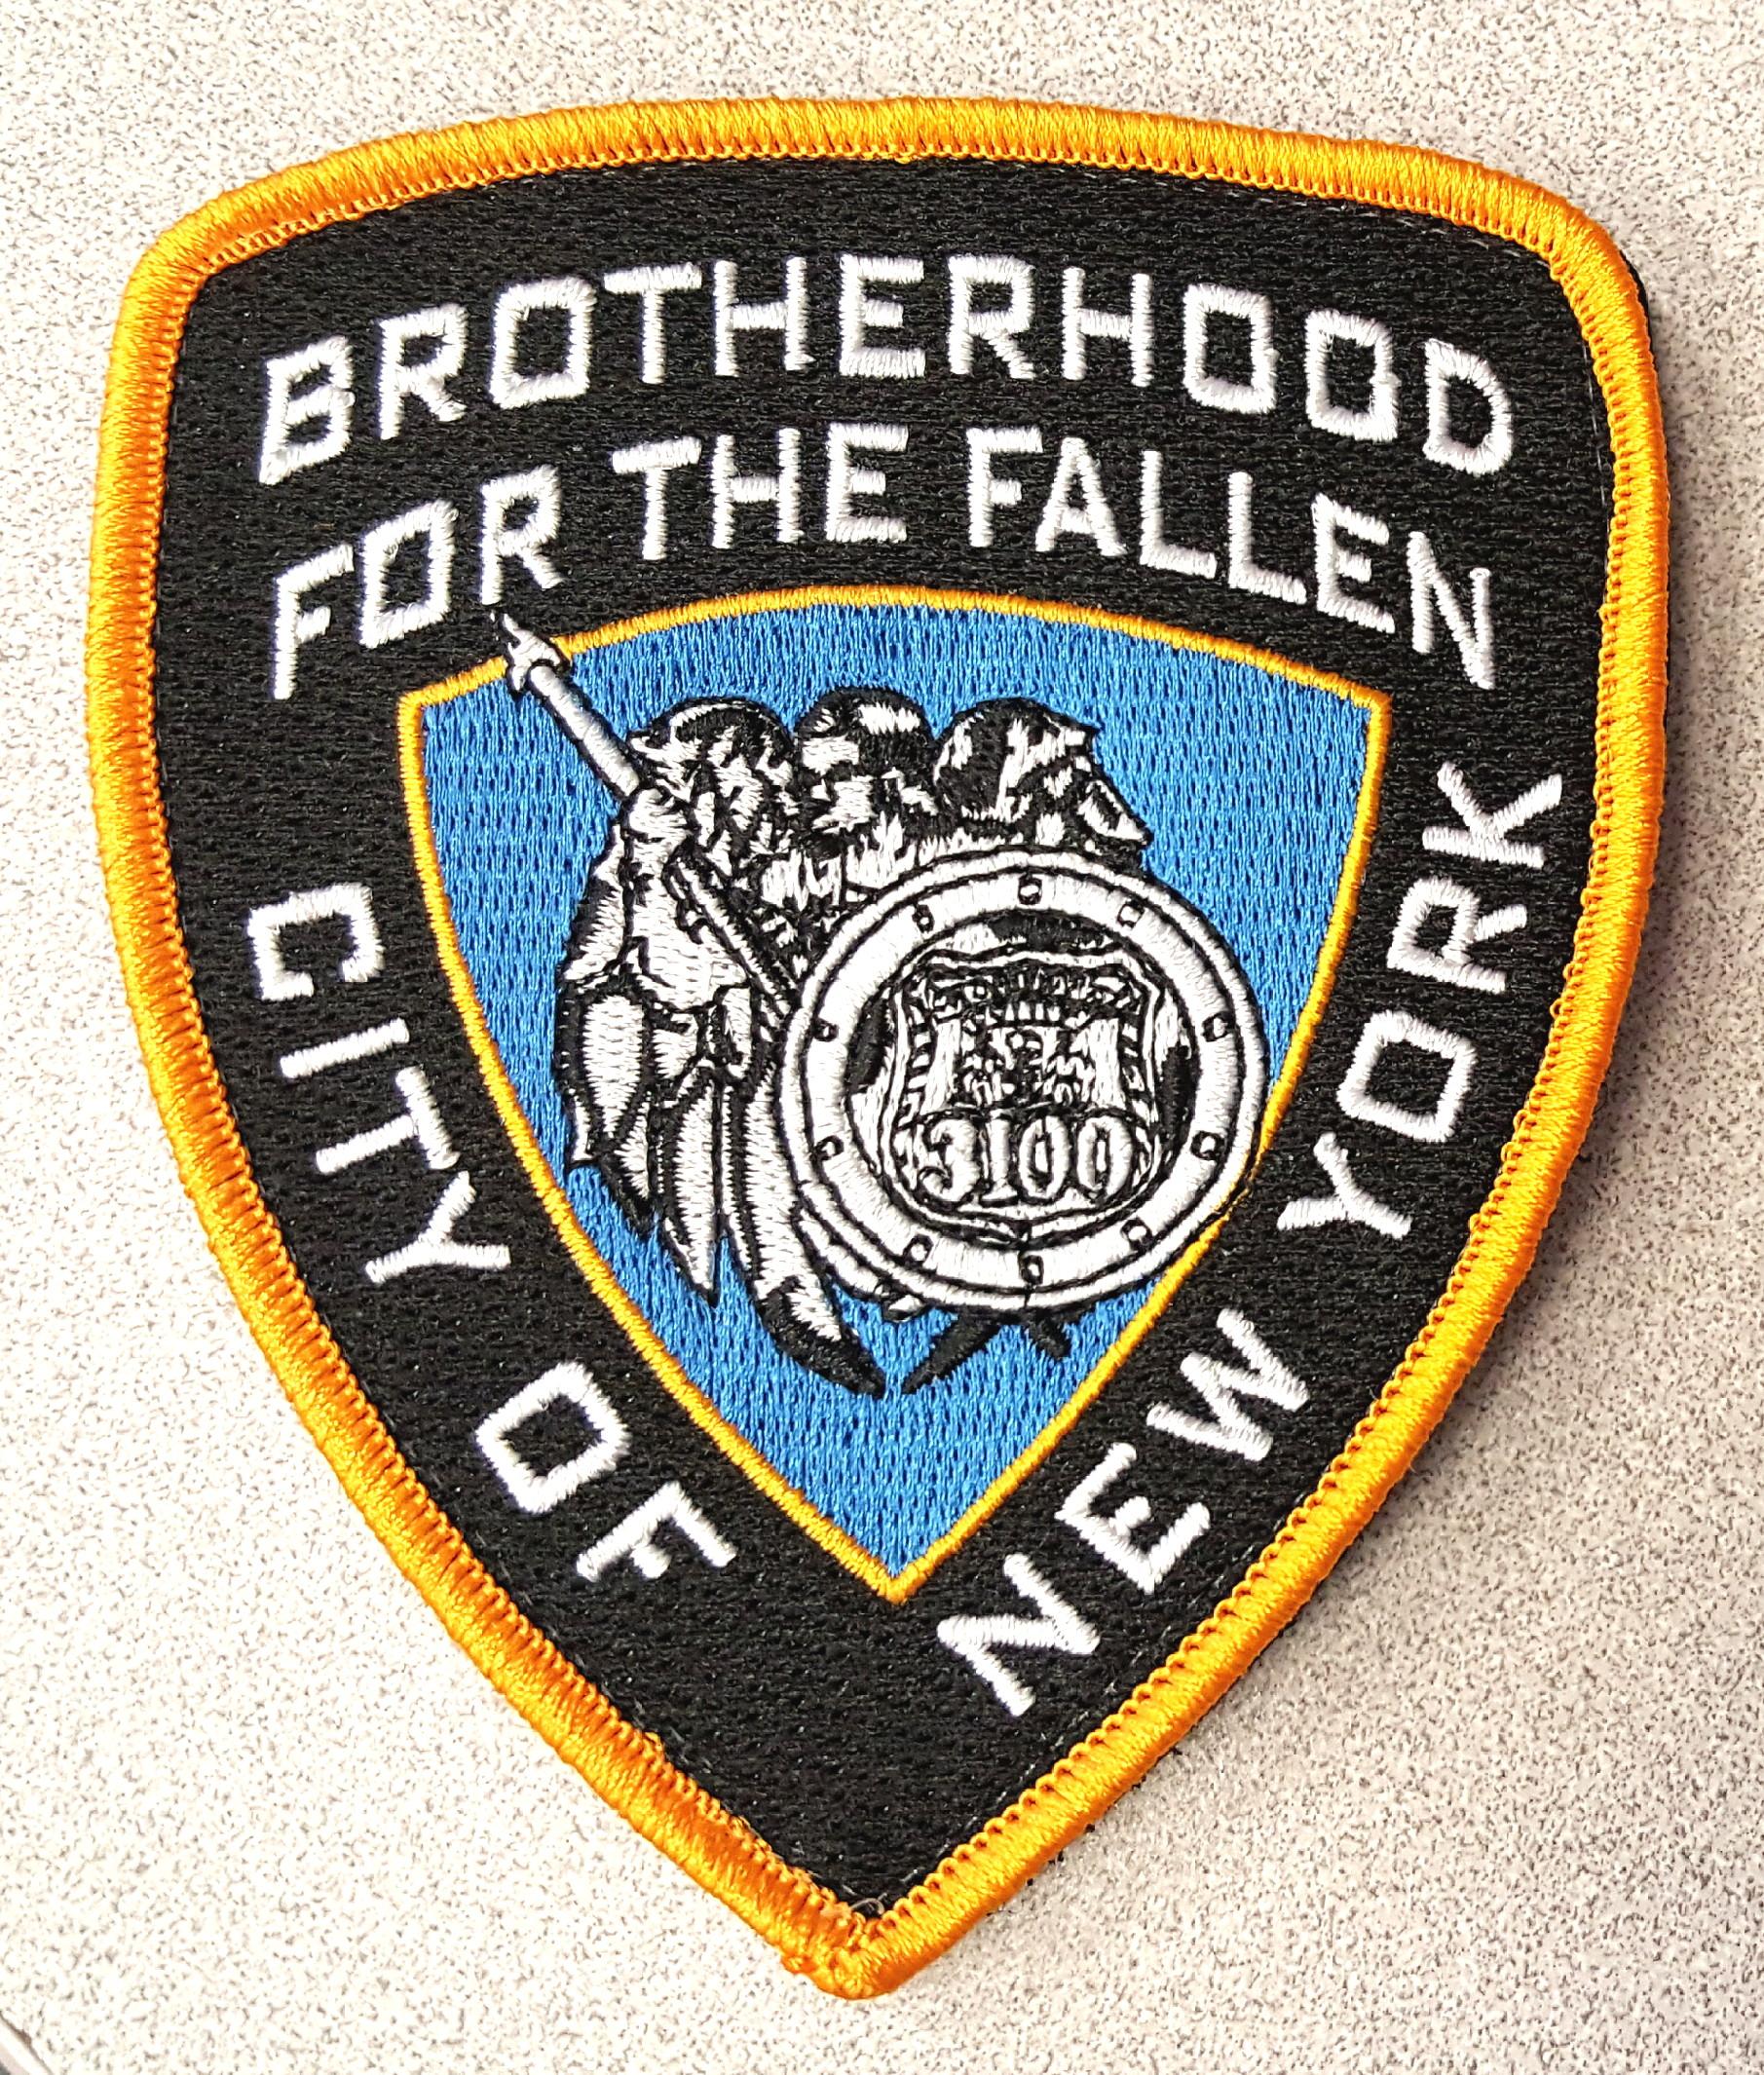 Brotherhoood Velcro Shoulder Patch — Brotherhood for the Fallen